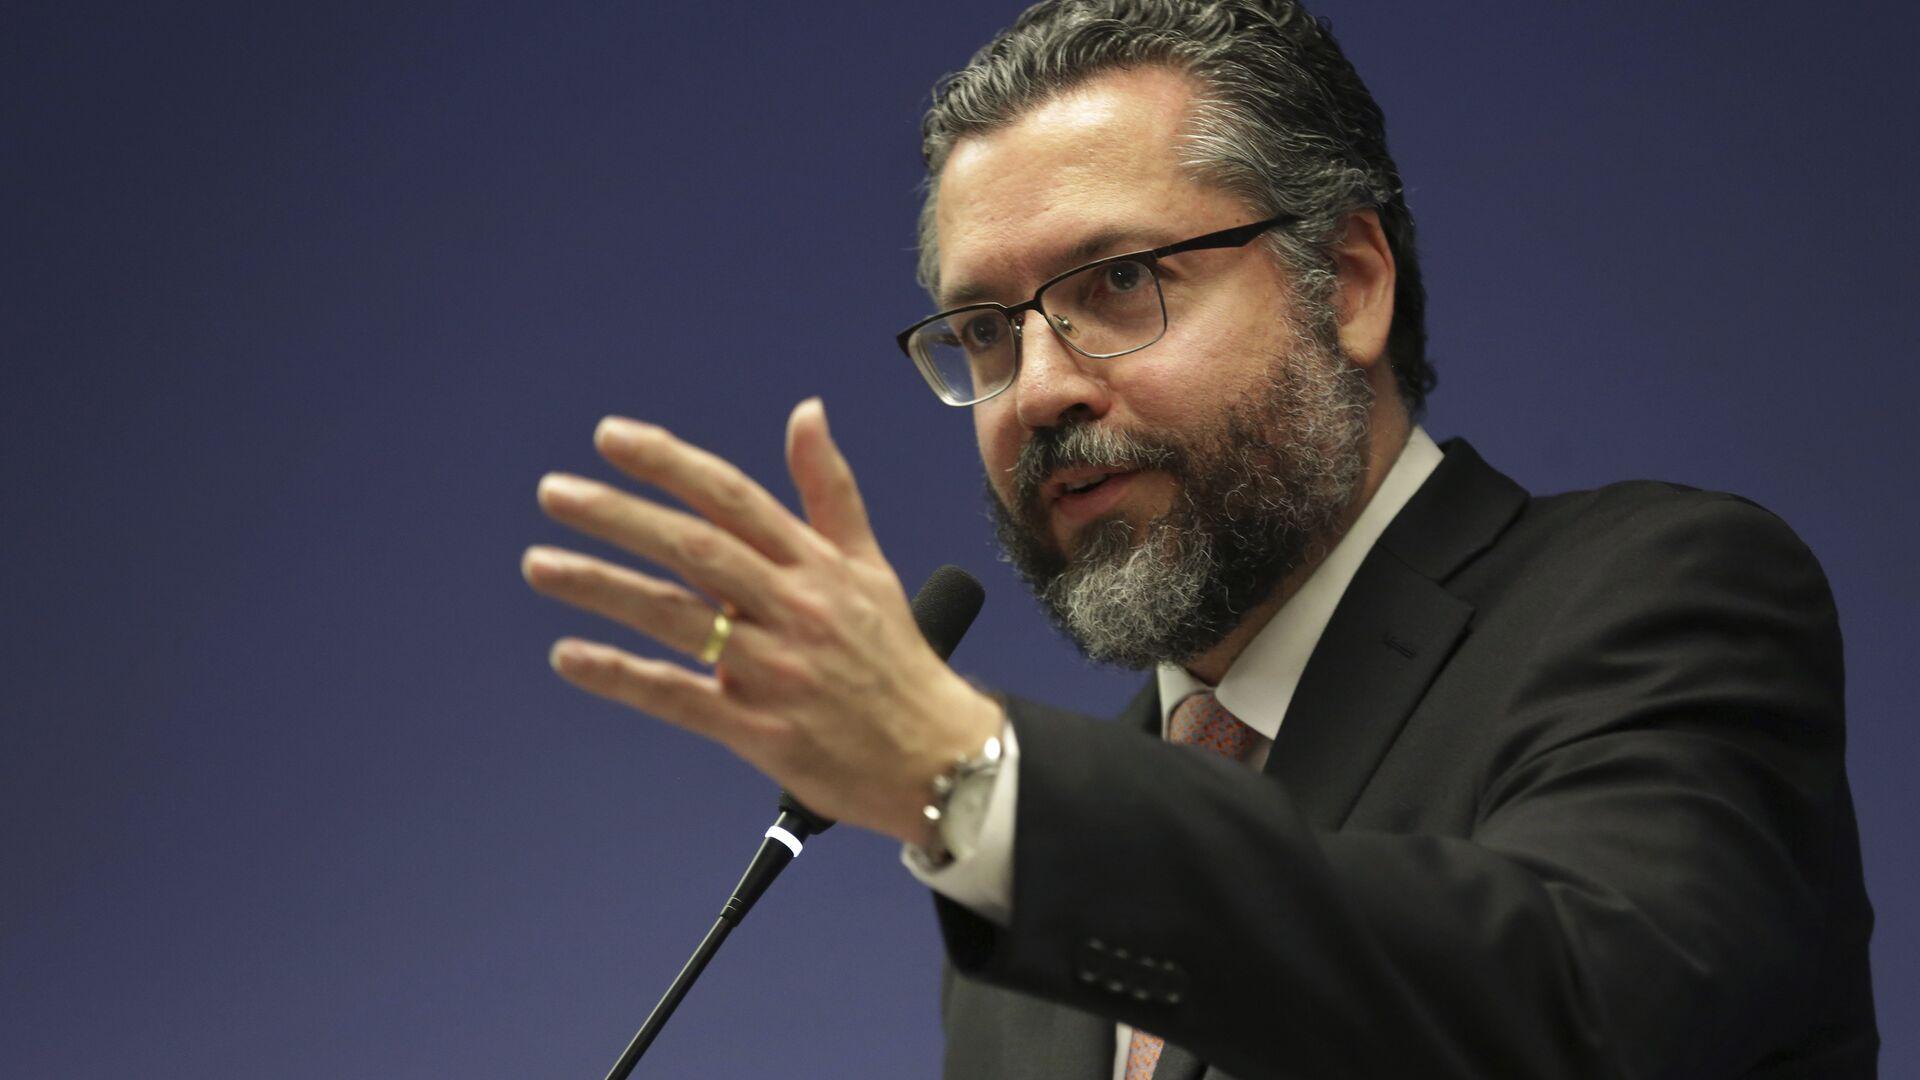 Ernesto Araújo, ministro de Relaciones Exteriores de Brasil - Sputnik Mundo, 1920, 24.03.2021